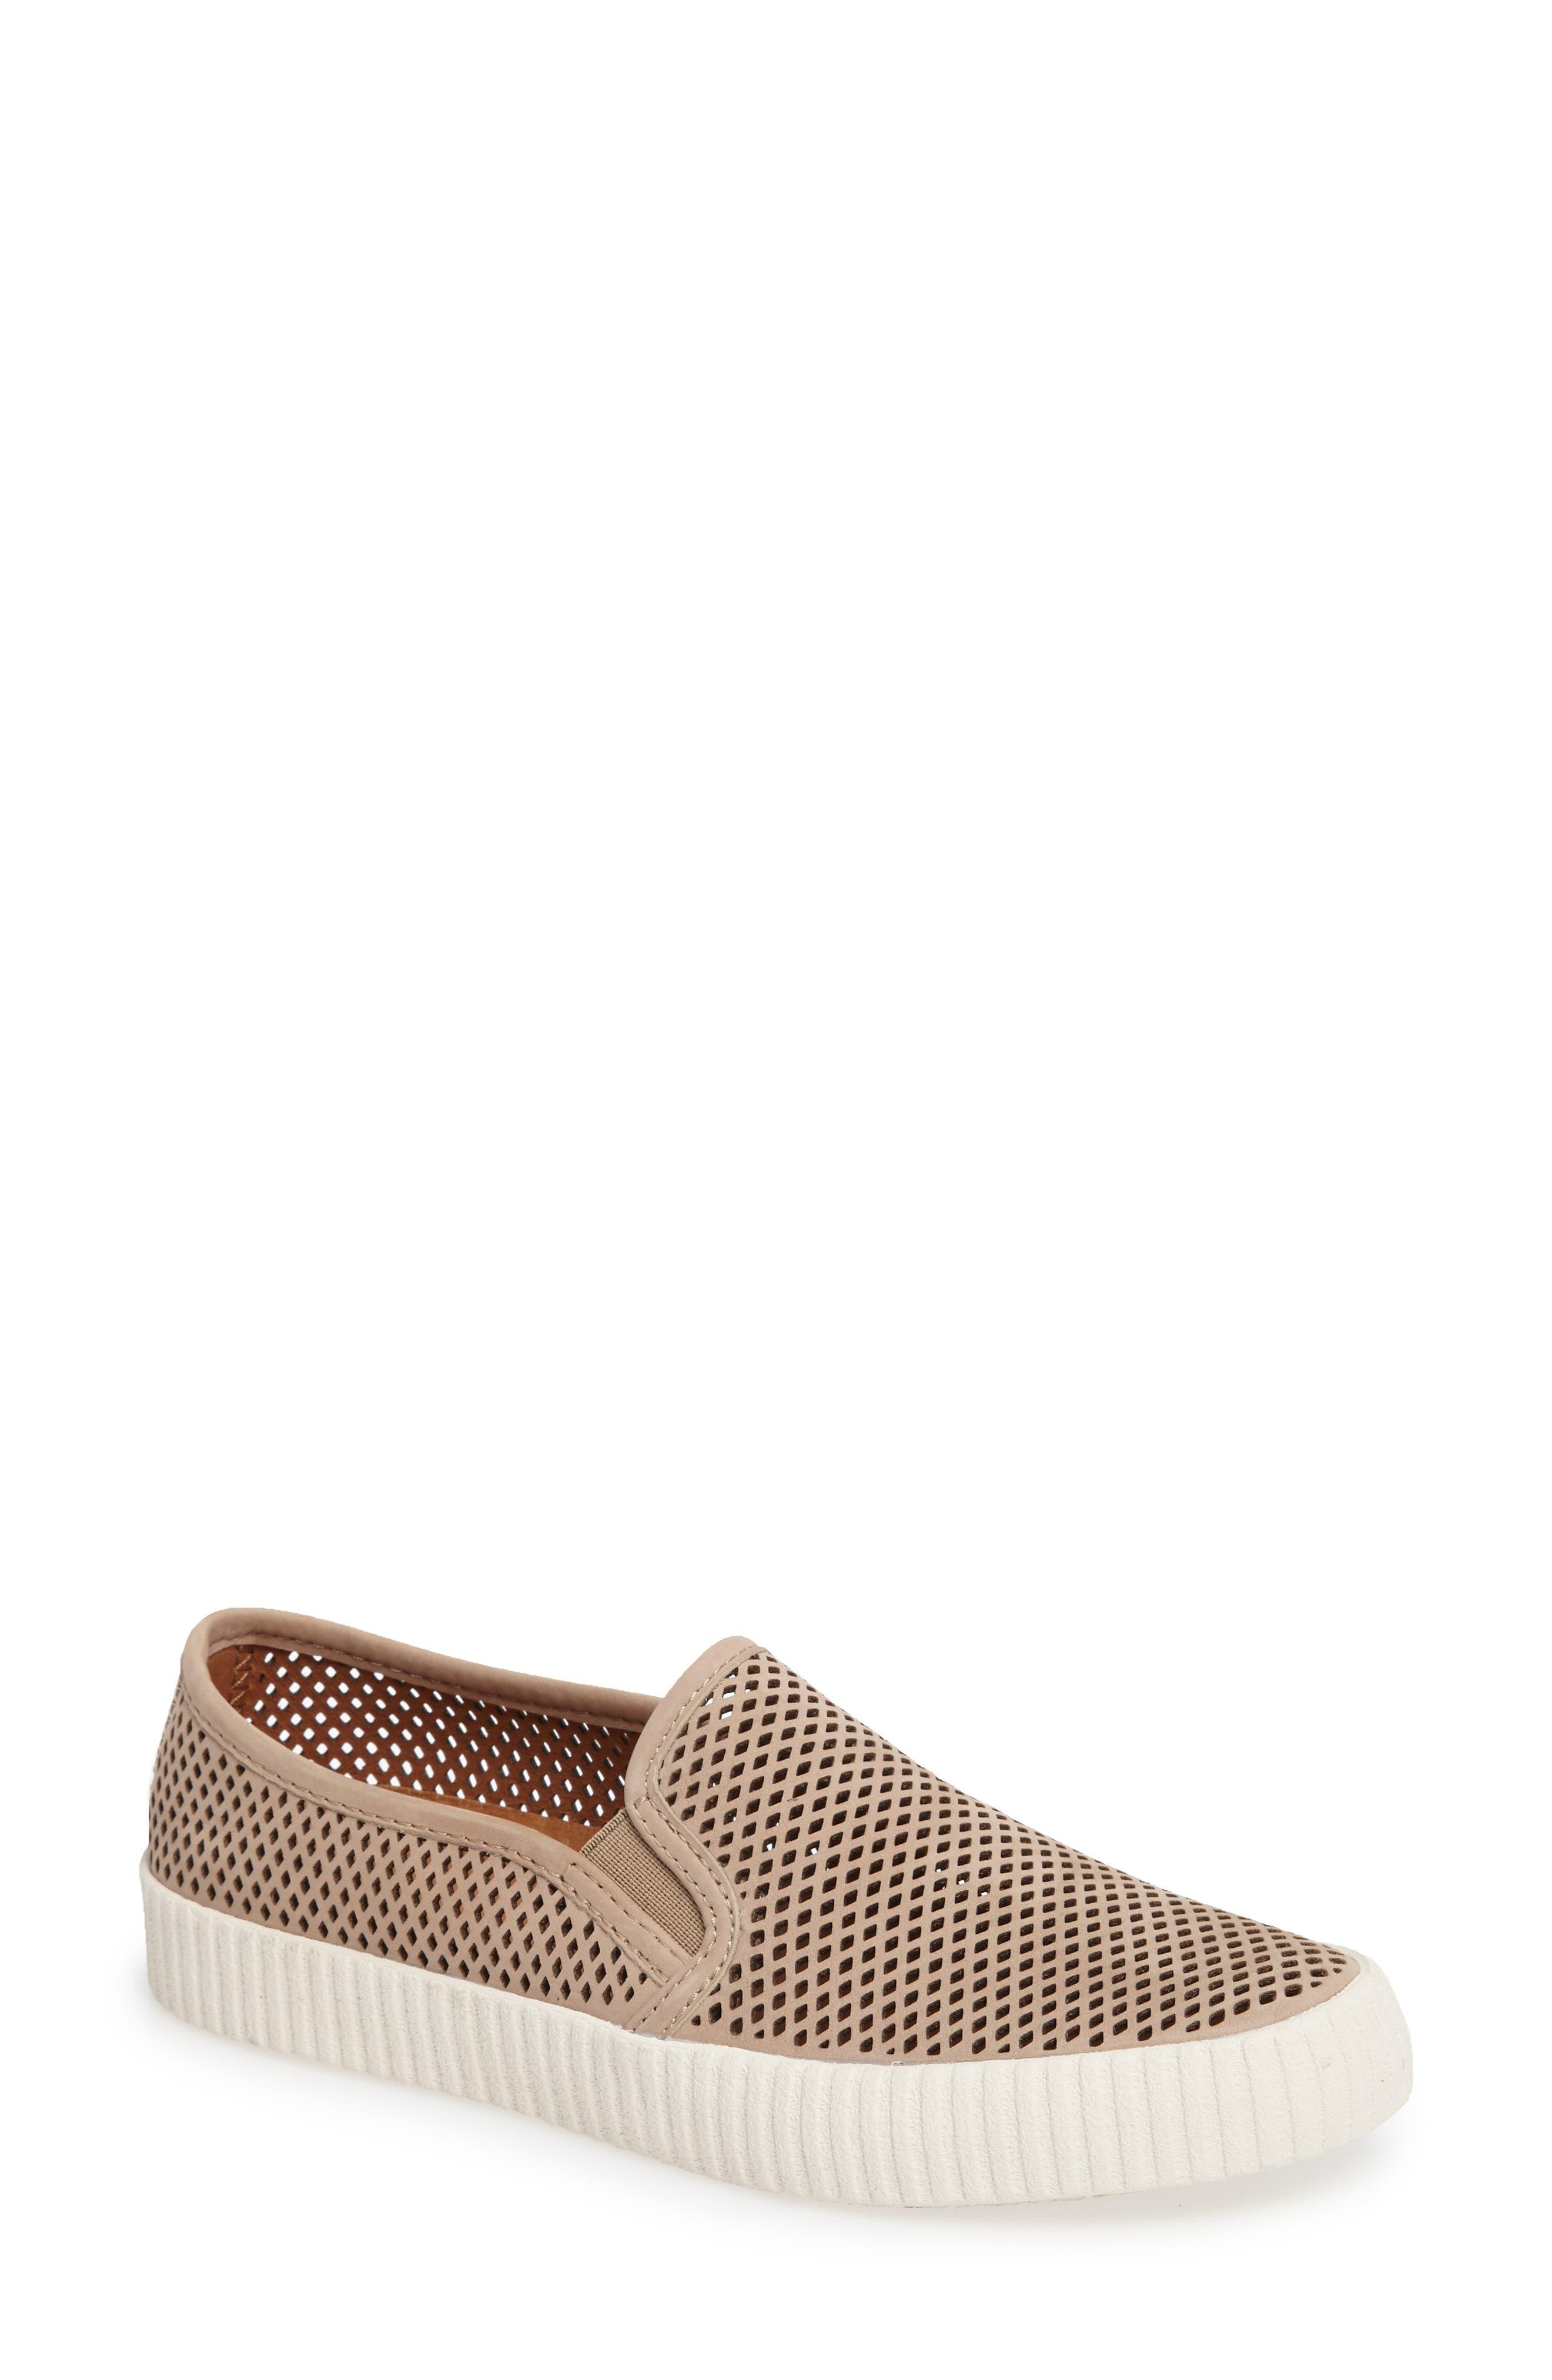 Alternate Image 1 Selected - Frye Camille Perforated Slip-On Sneaker (Women)